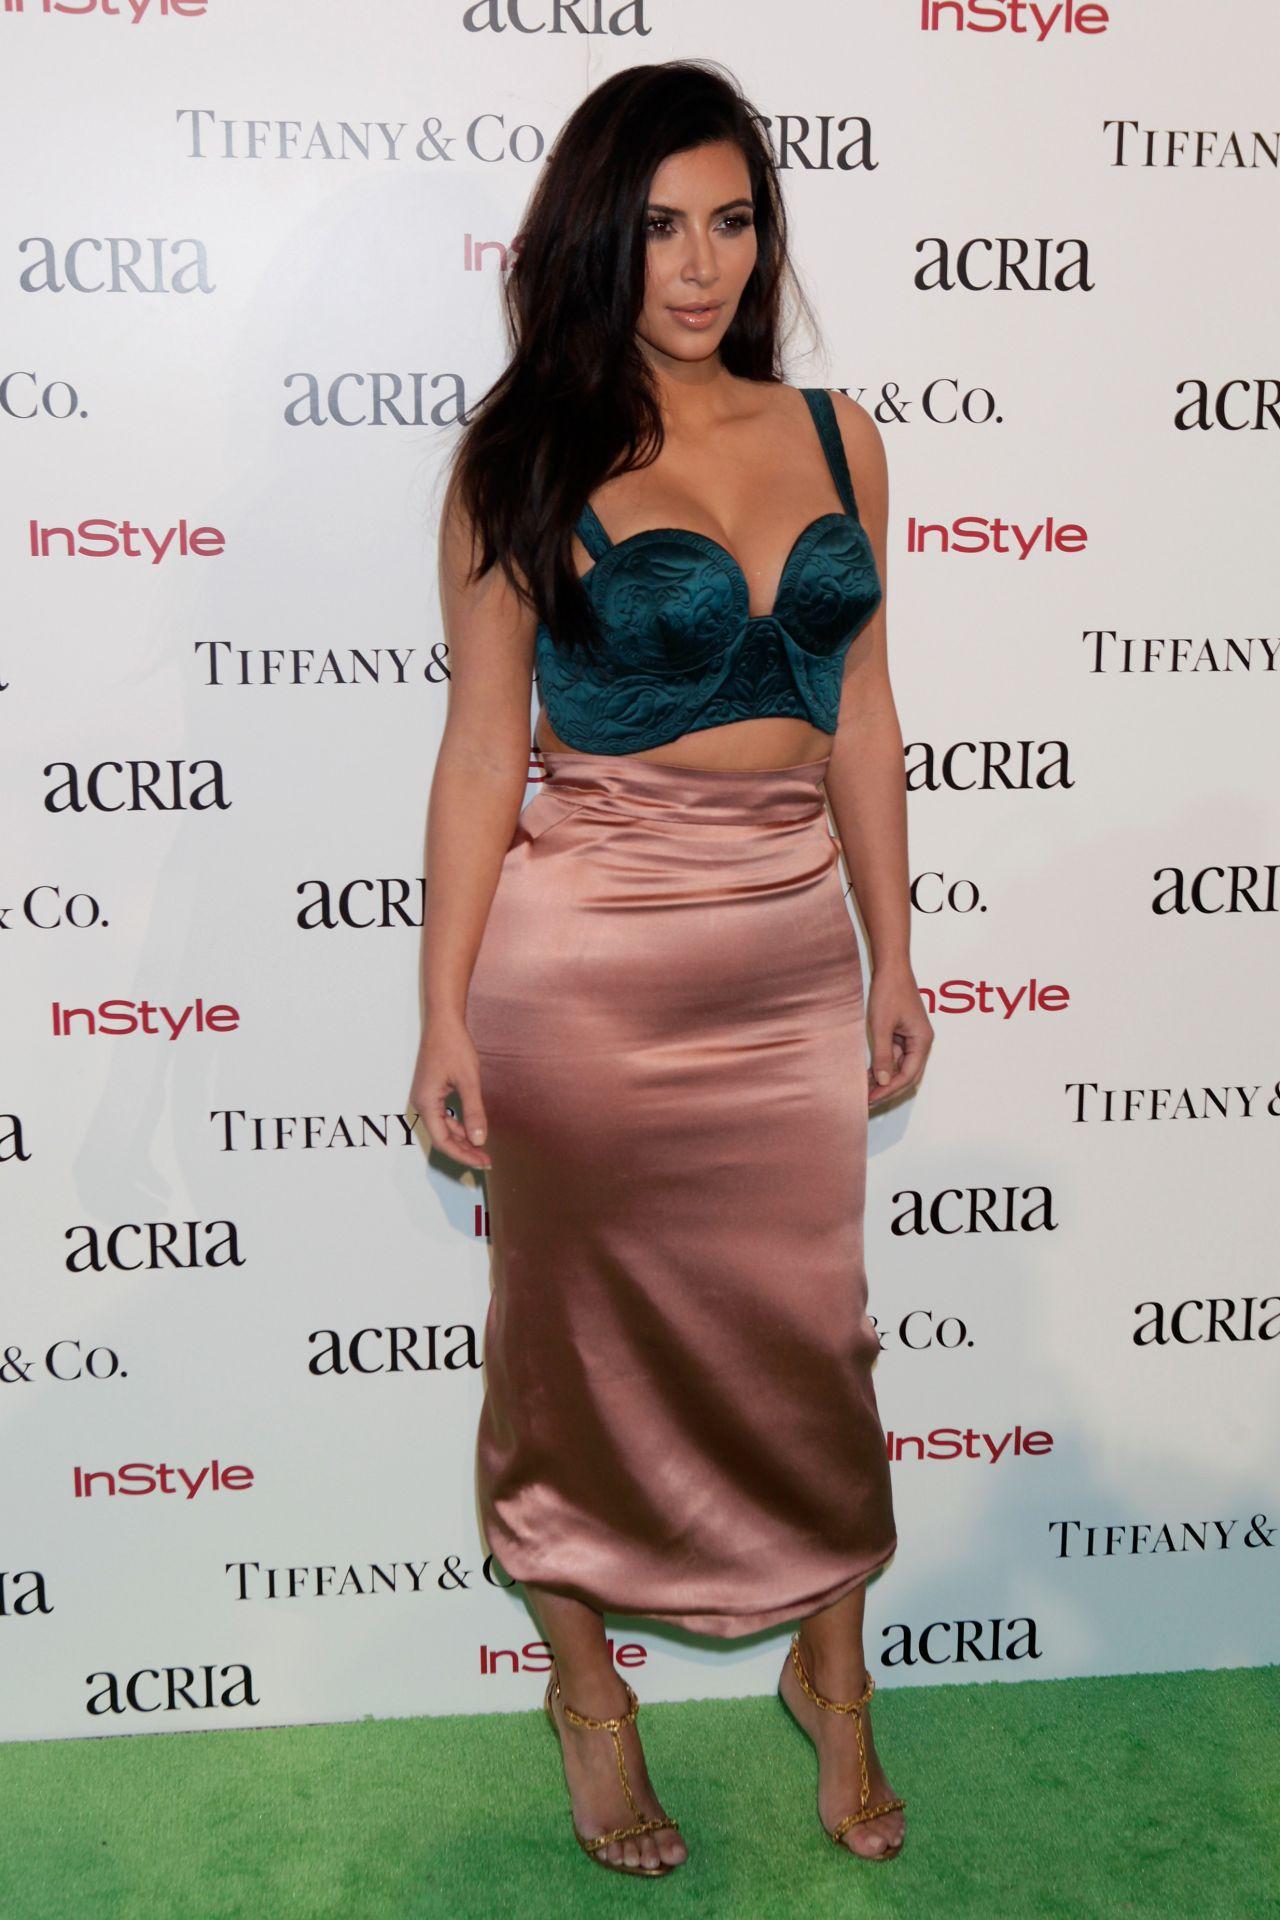 Kim Kardashian Style - 2014 ACRIA Holiday Dinner in New York City